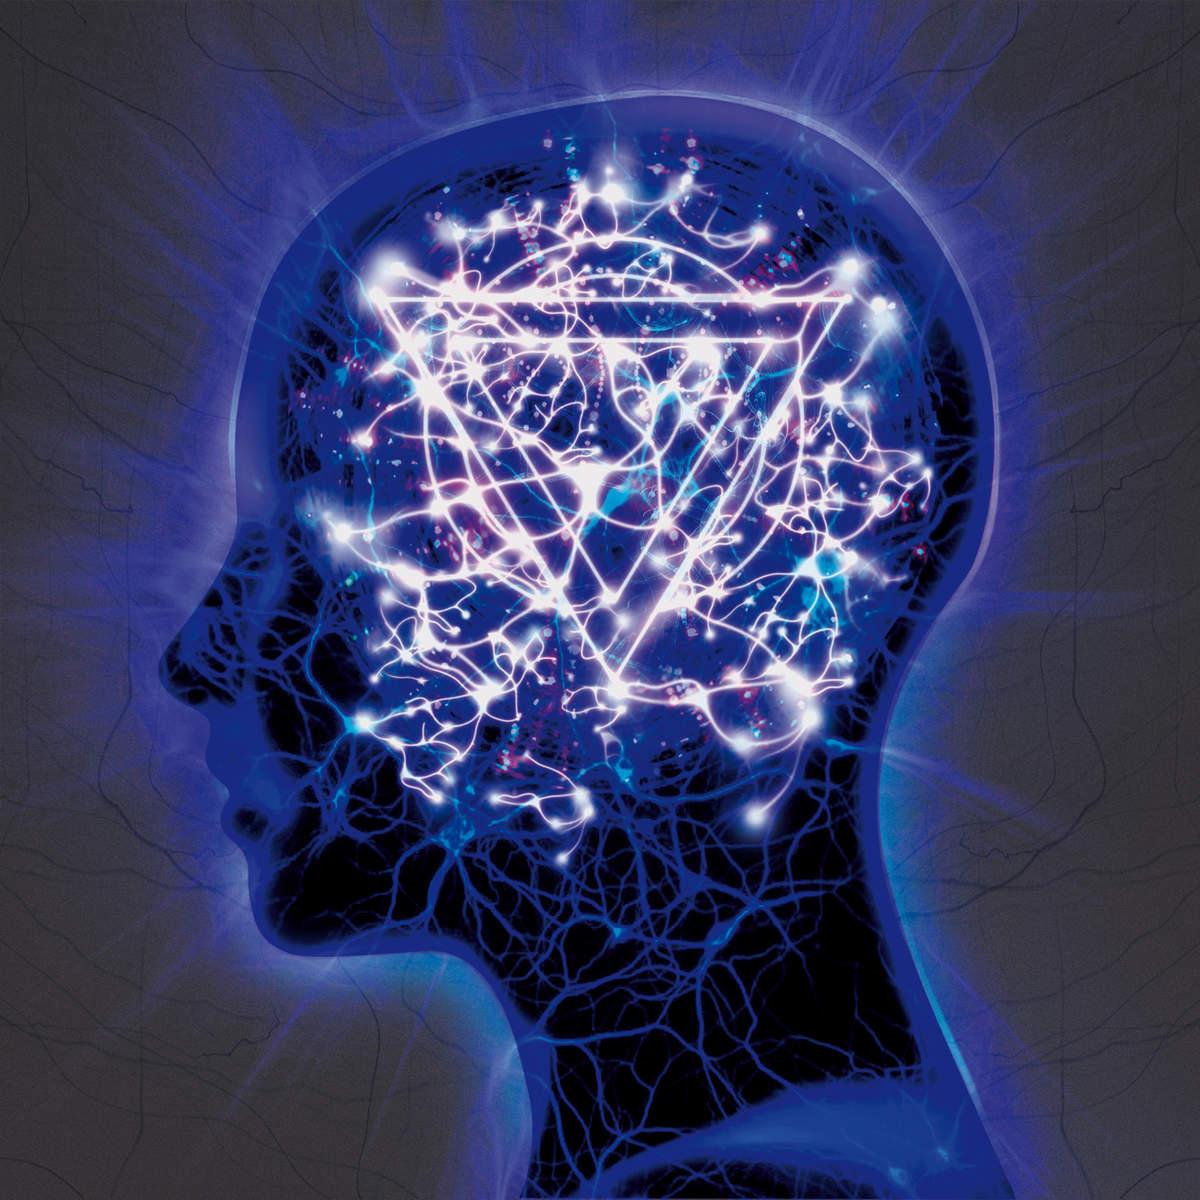 Risultato immagini per enter shikari the mindsweep